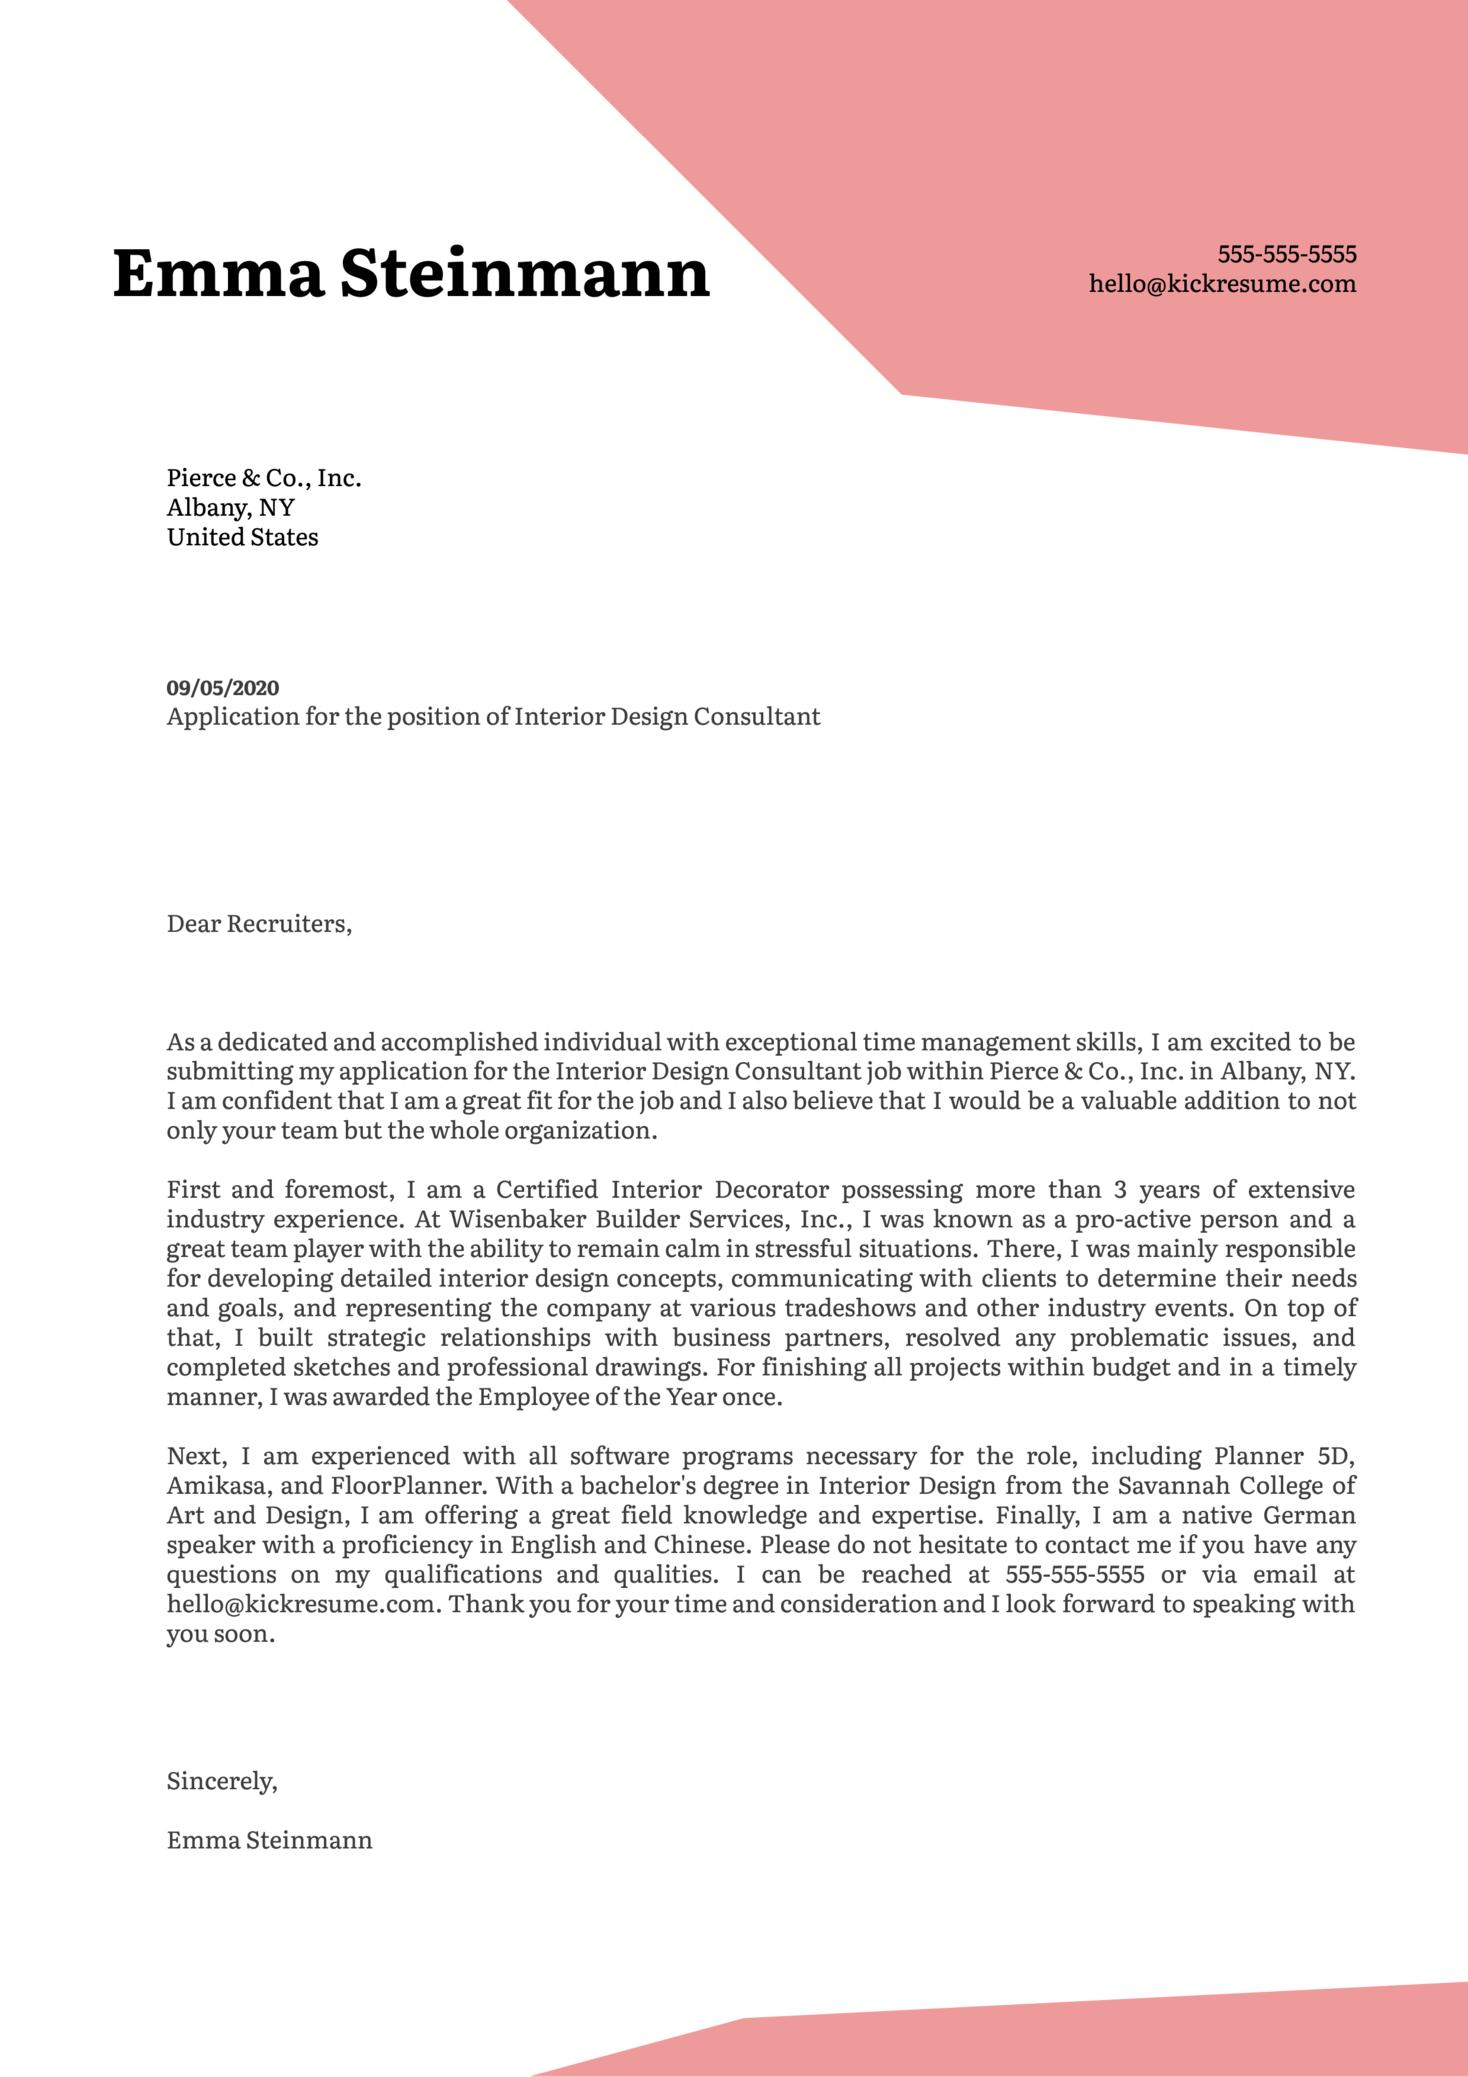 Interior Design Consultant Cover Letter Example